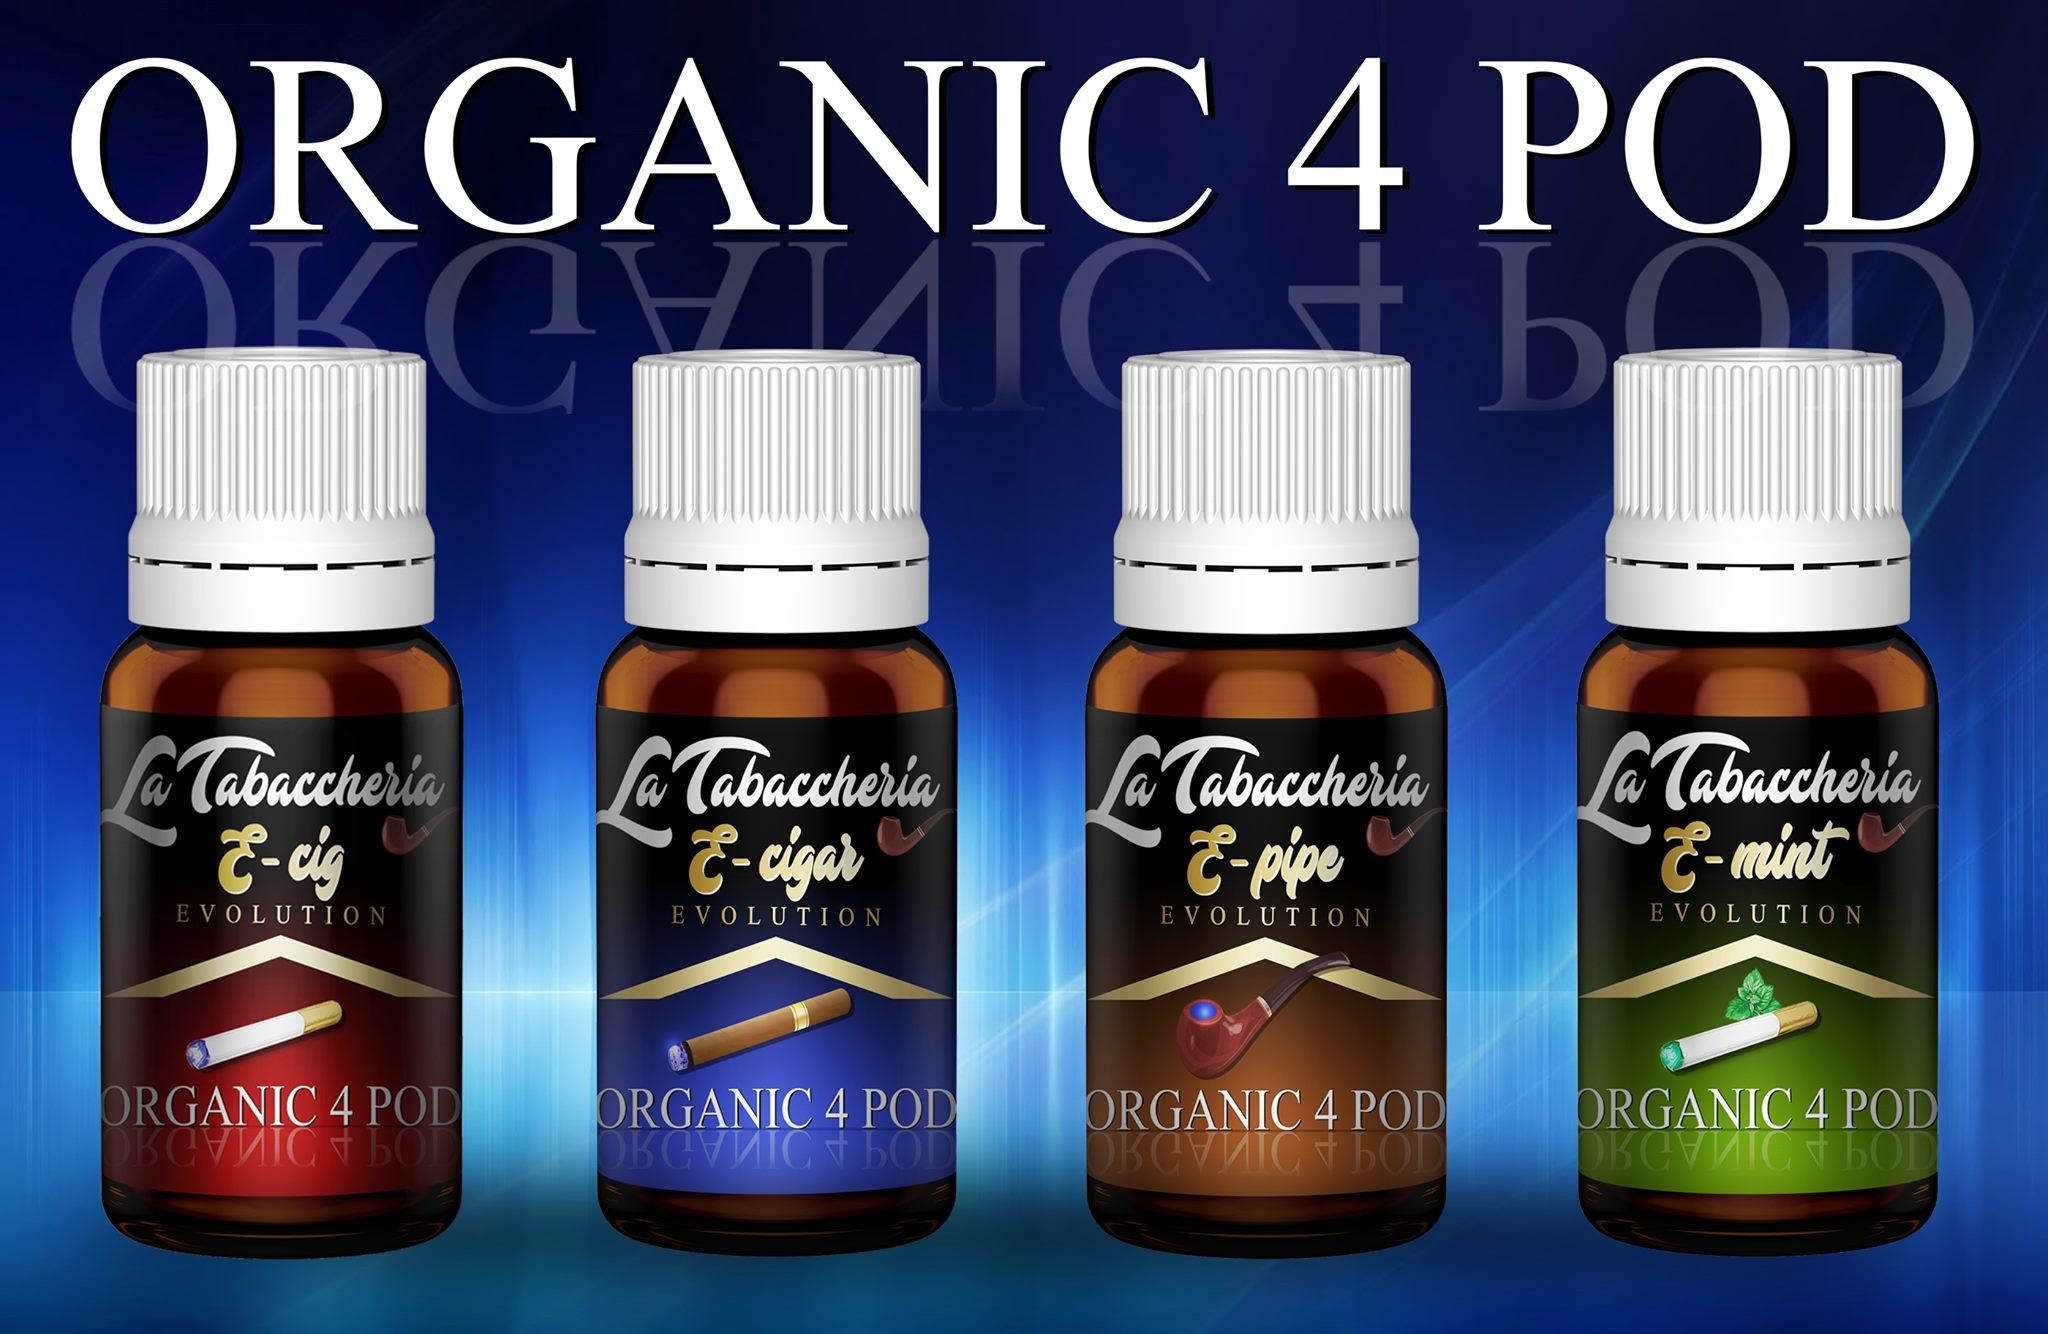 Linea Organic 4 Pod